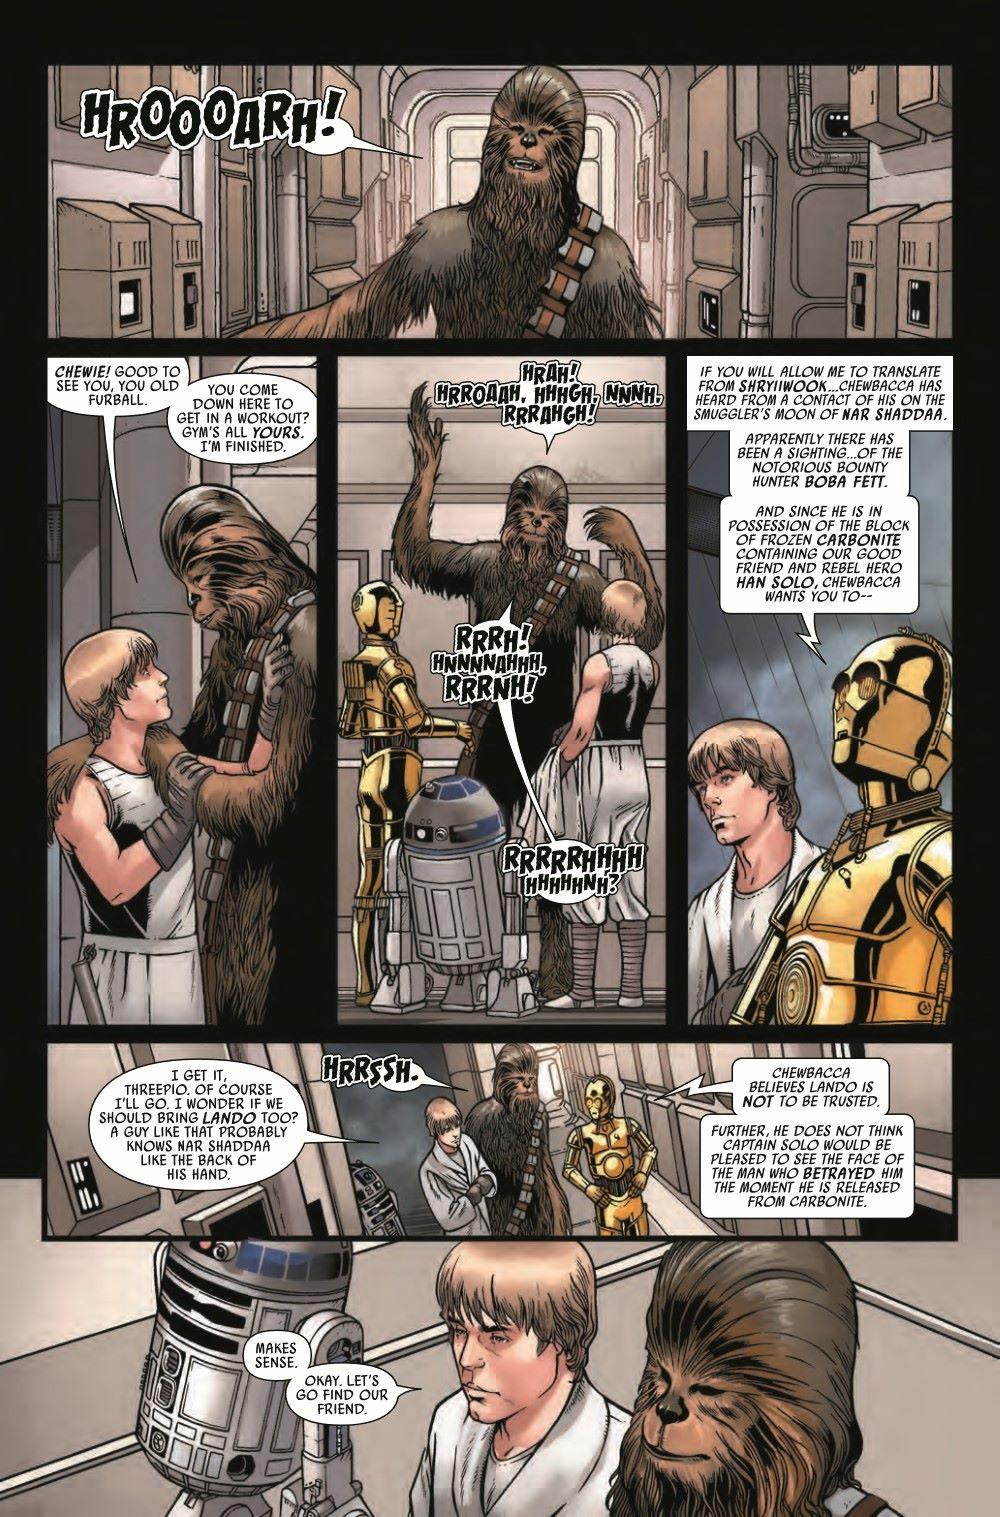 STWARS2020013_Preview-7 ComicList Previews: STAR WARS #13